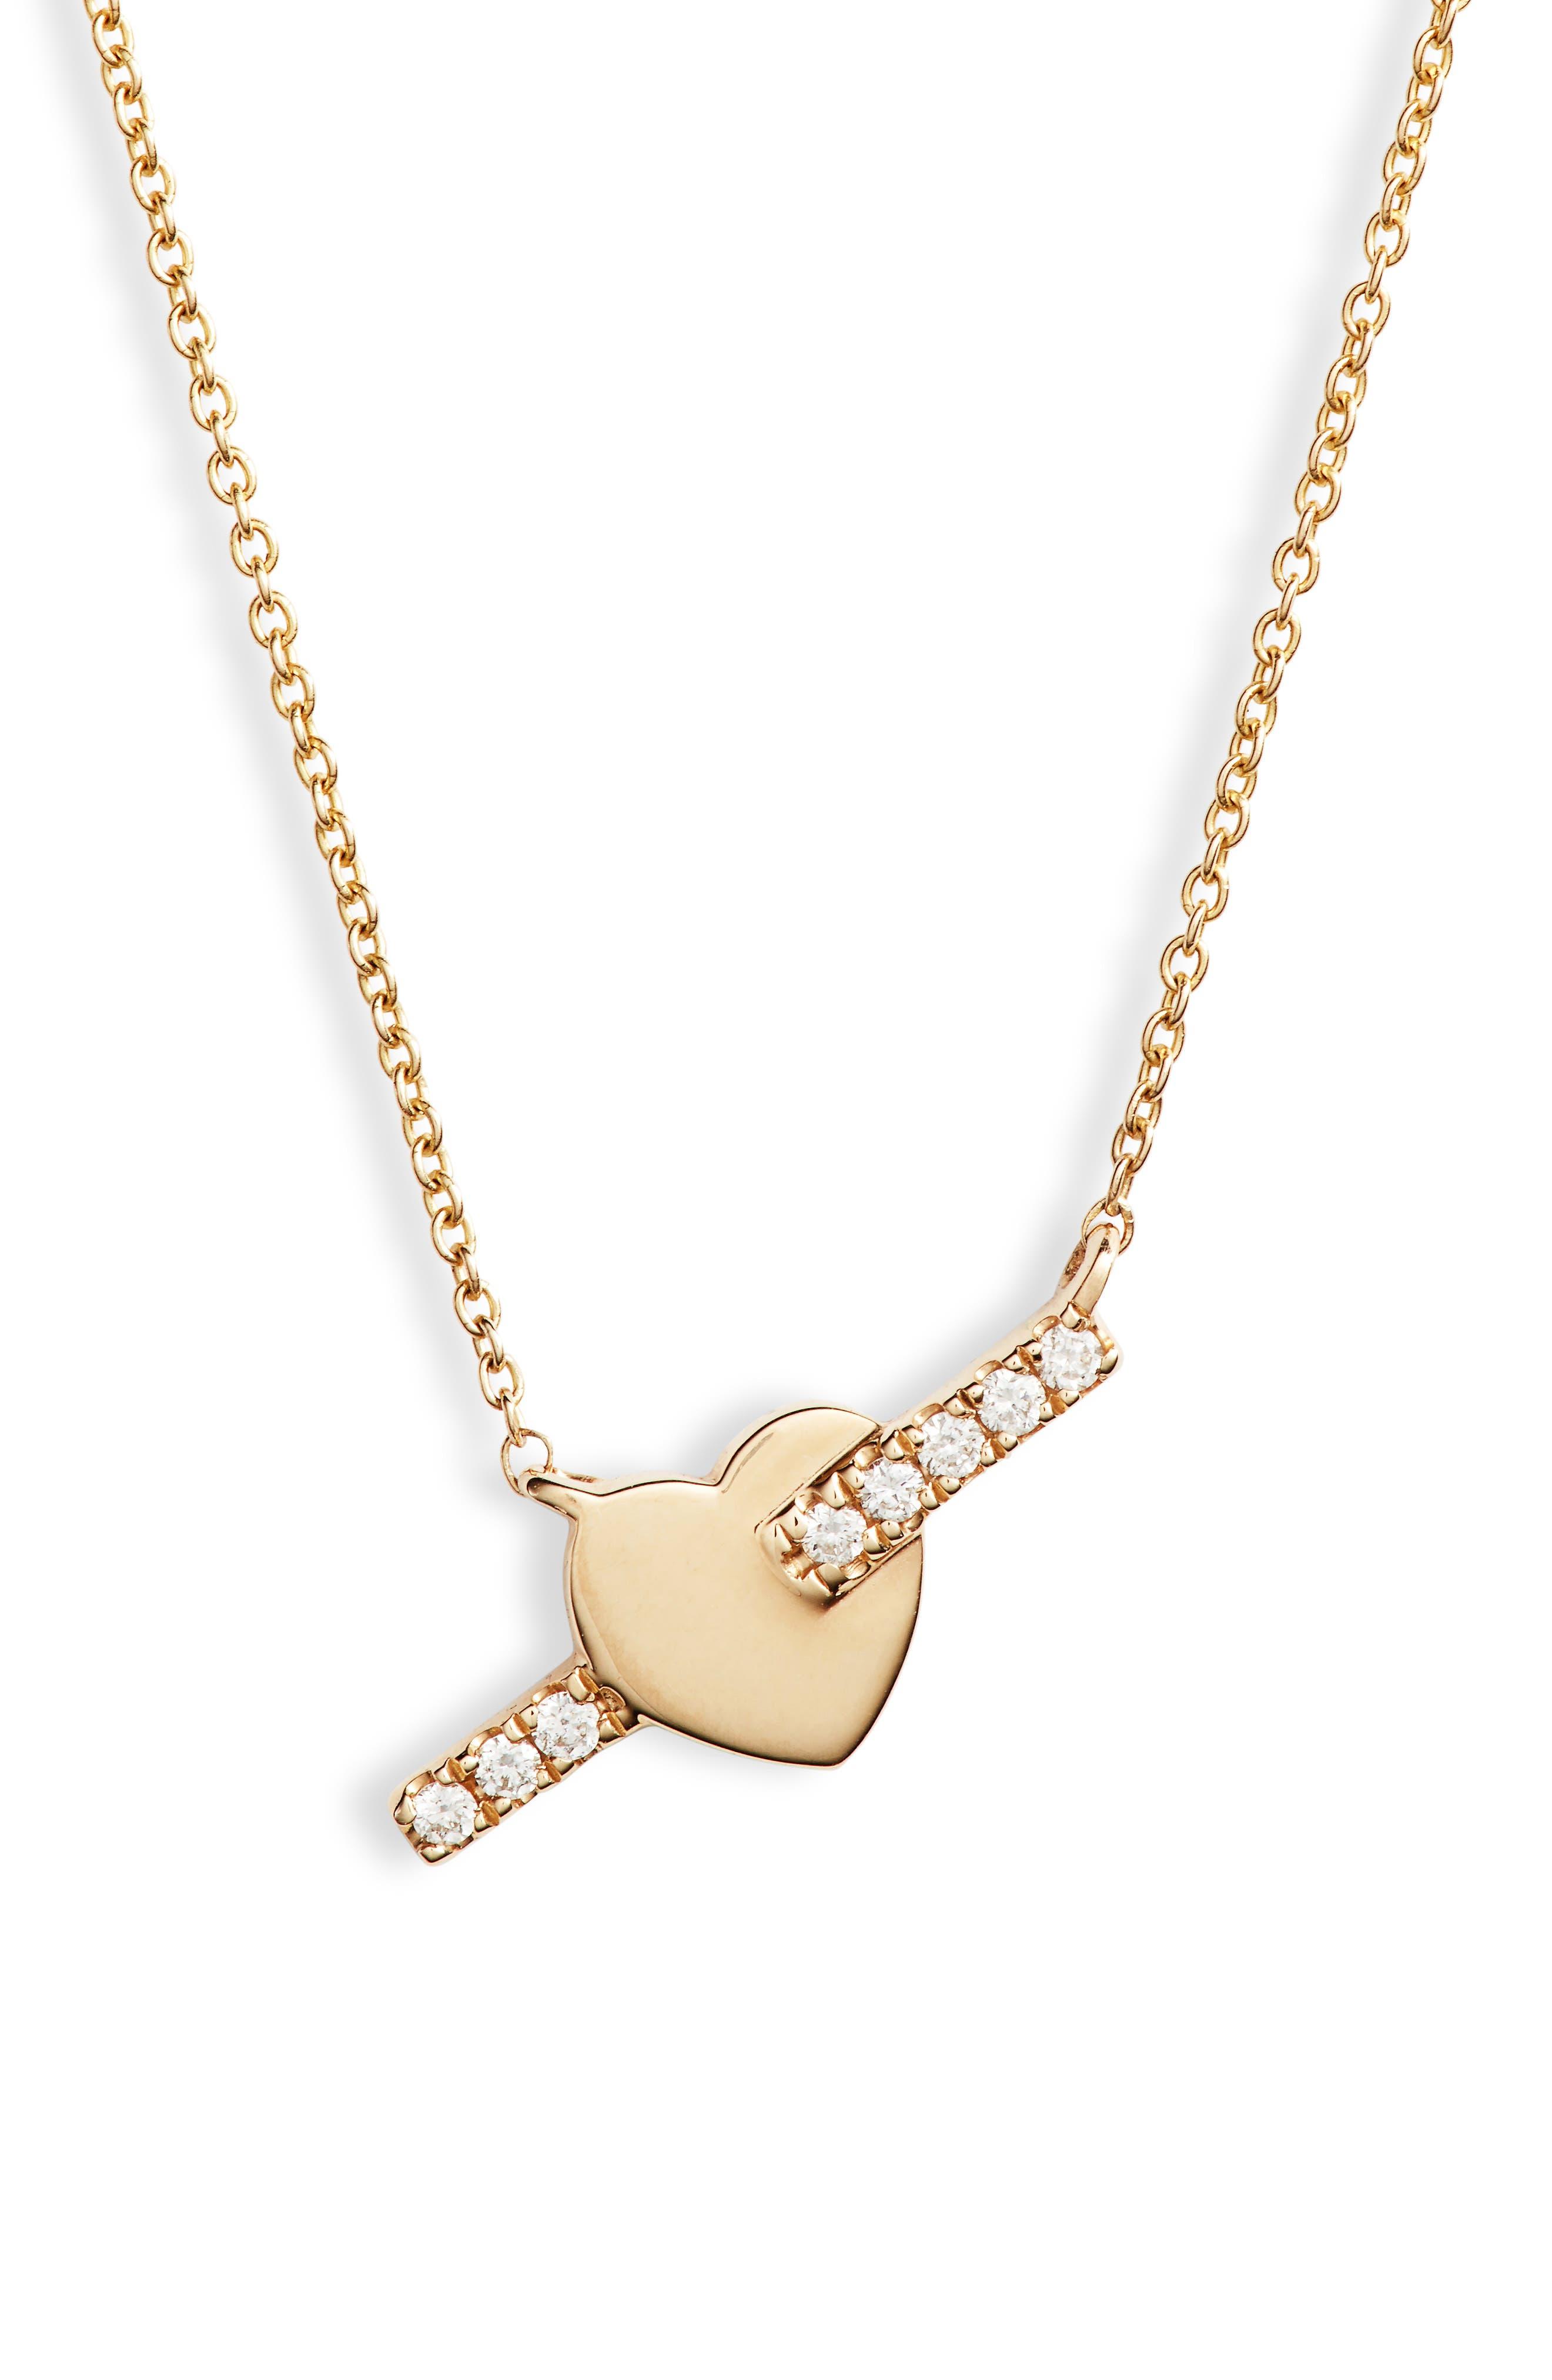 DANA REBECCA DESIGNS, Dana Rebecca Livi Gold Heart Bar Diamond Necklace, Main thumbnail 1, color, YELLOW GOLD/ DIAMOND